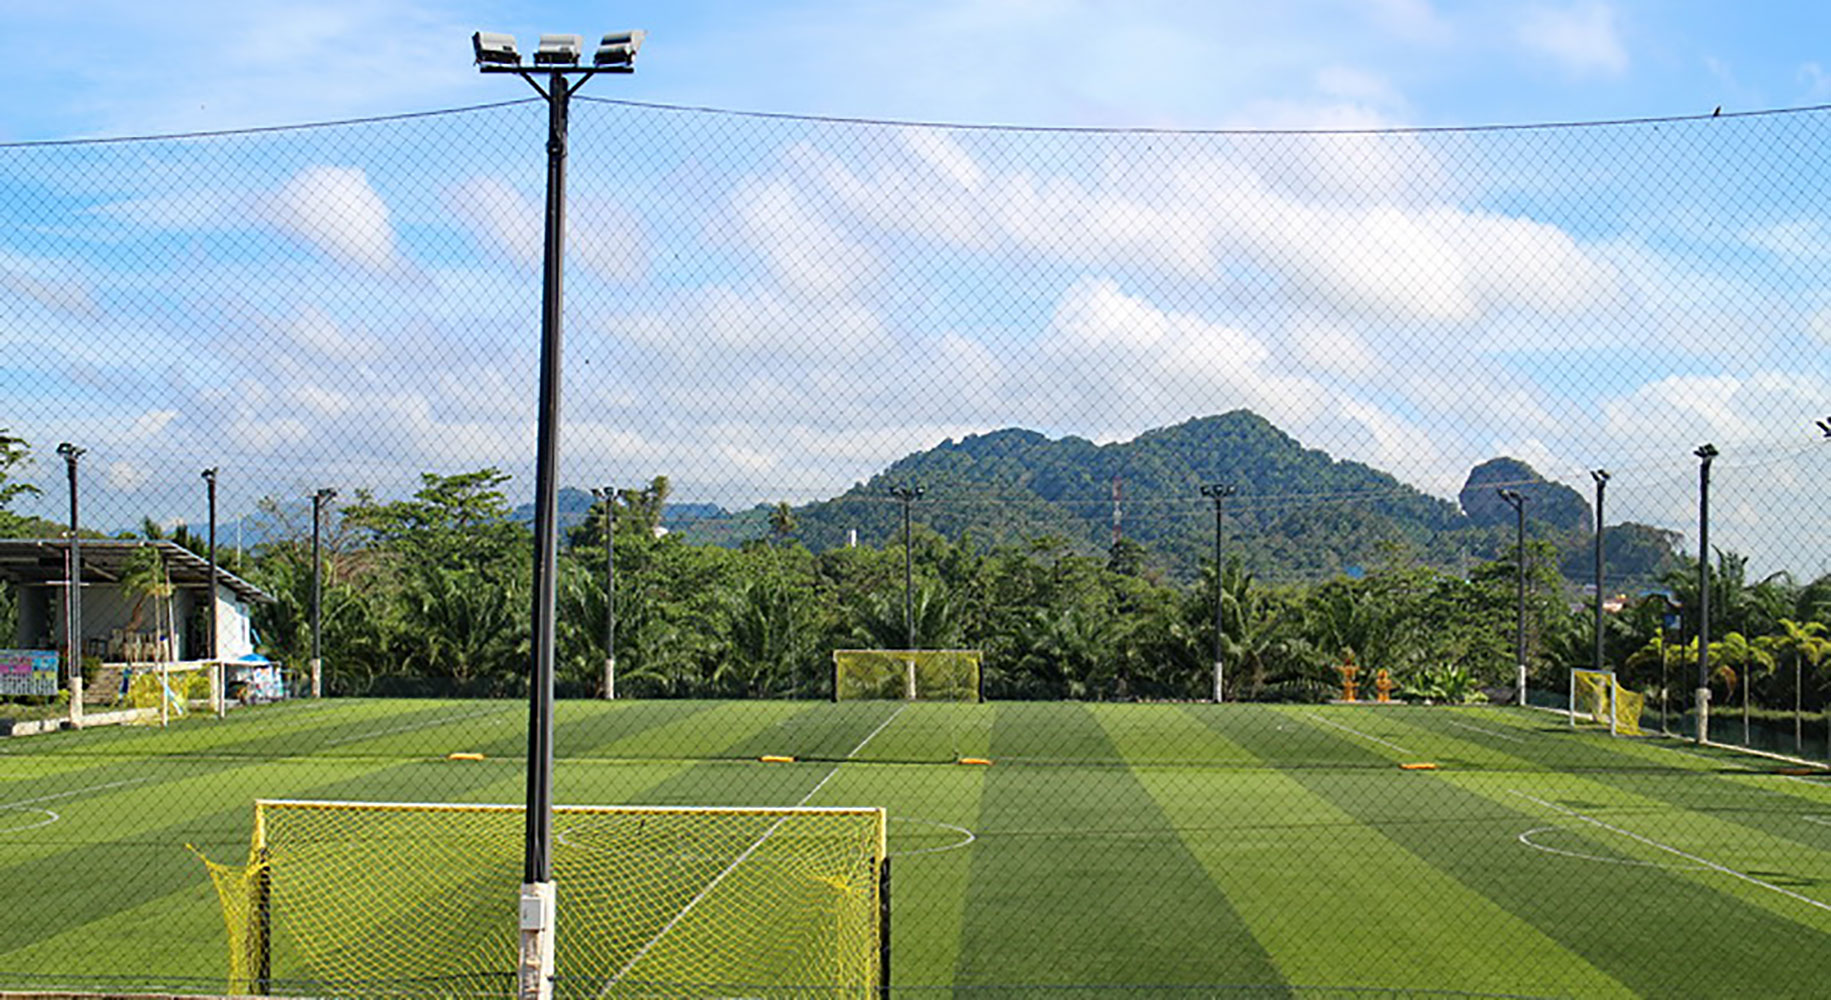 Soccer field filming location in Bangkok Thailand